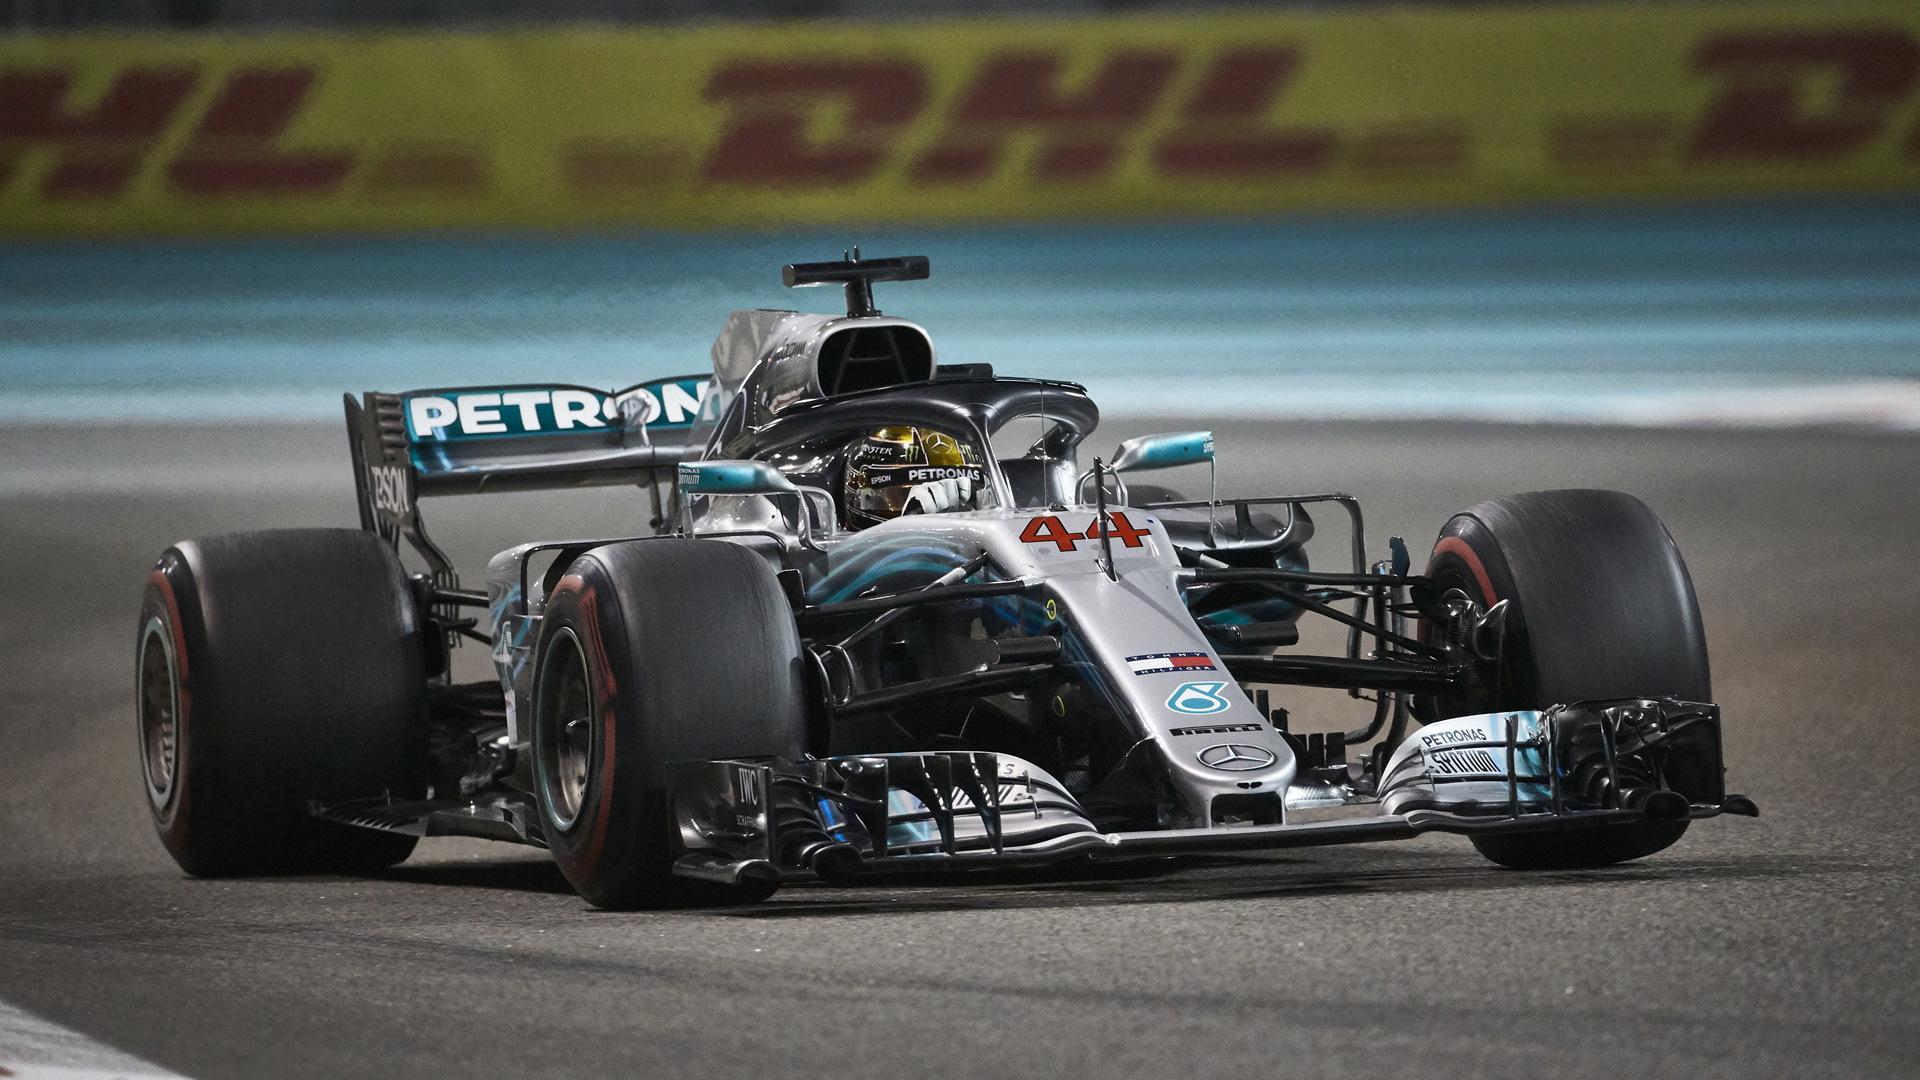 Mercedes-AMG's Lewis Hamilton at the 2018 Formula 1 Abu Dhabi Grand Prix